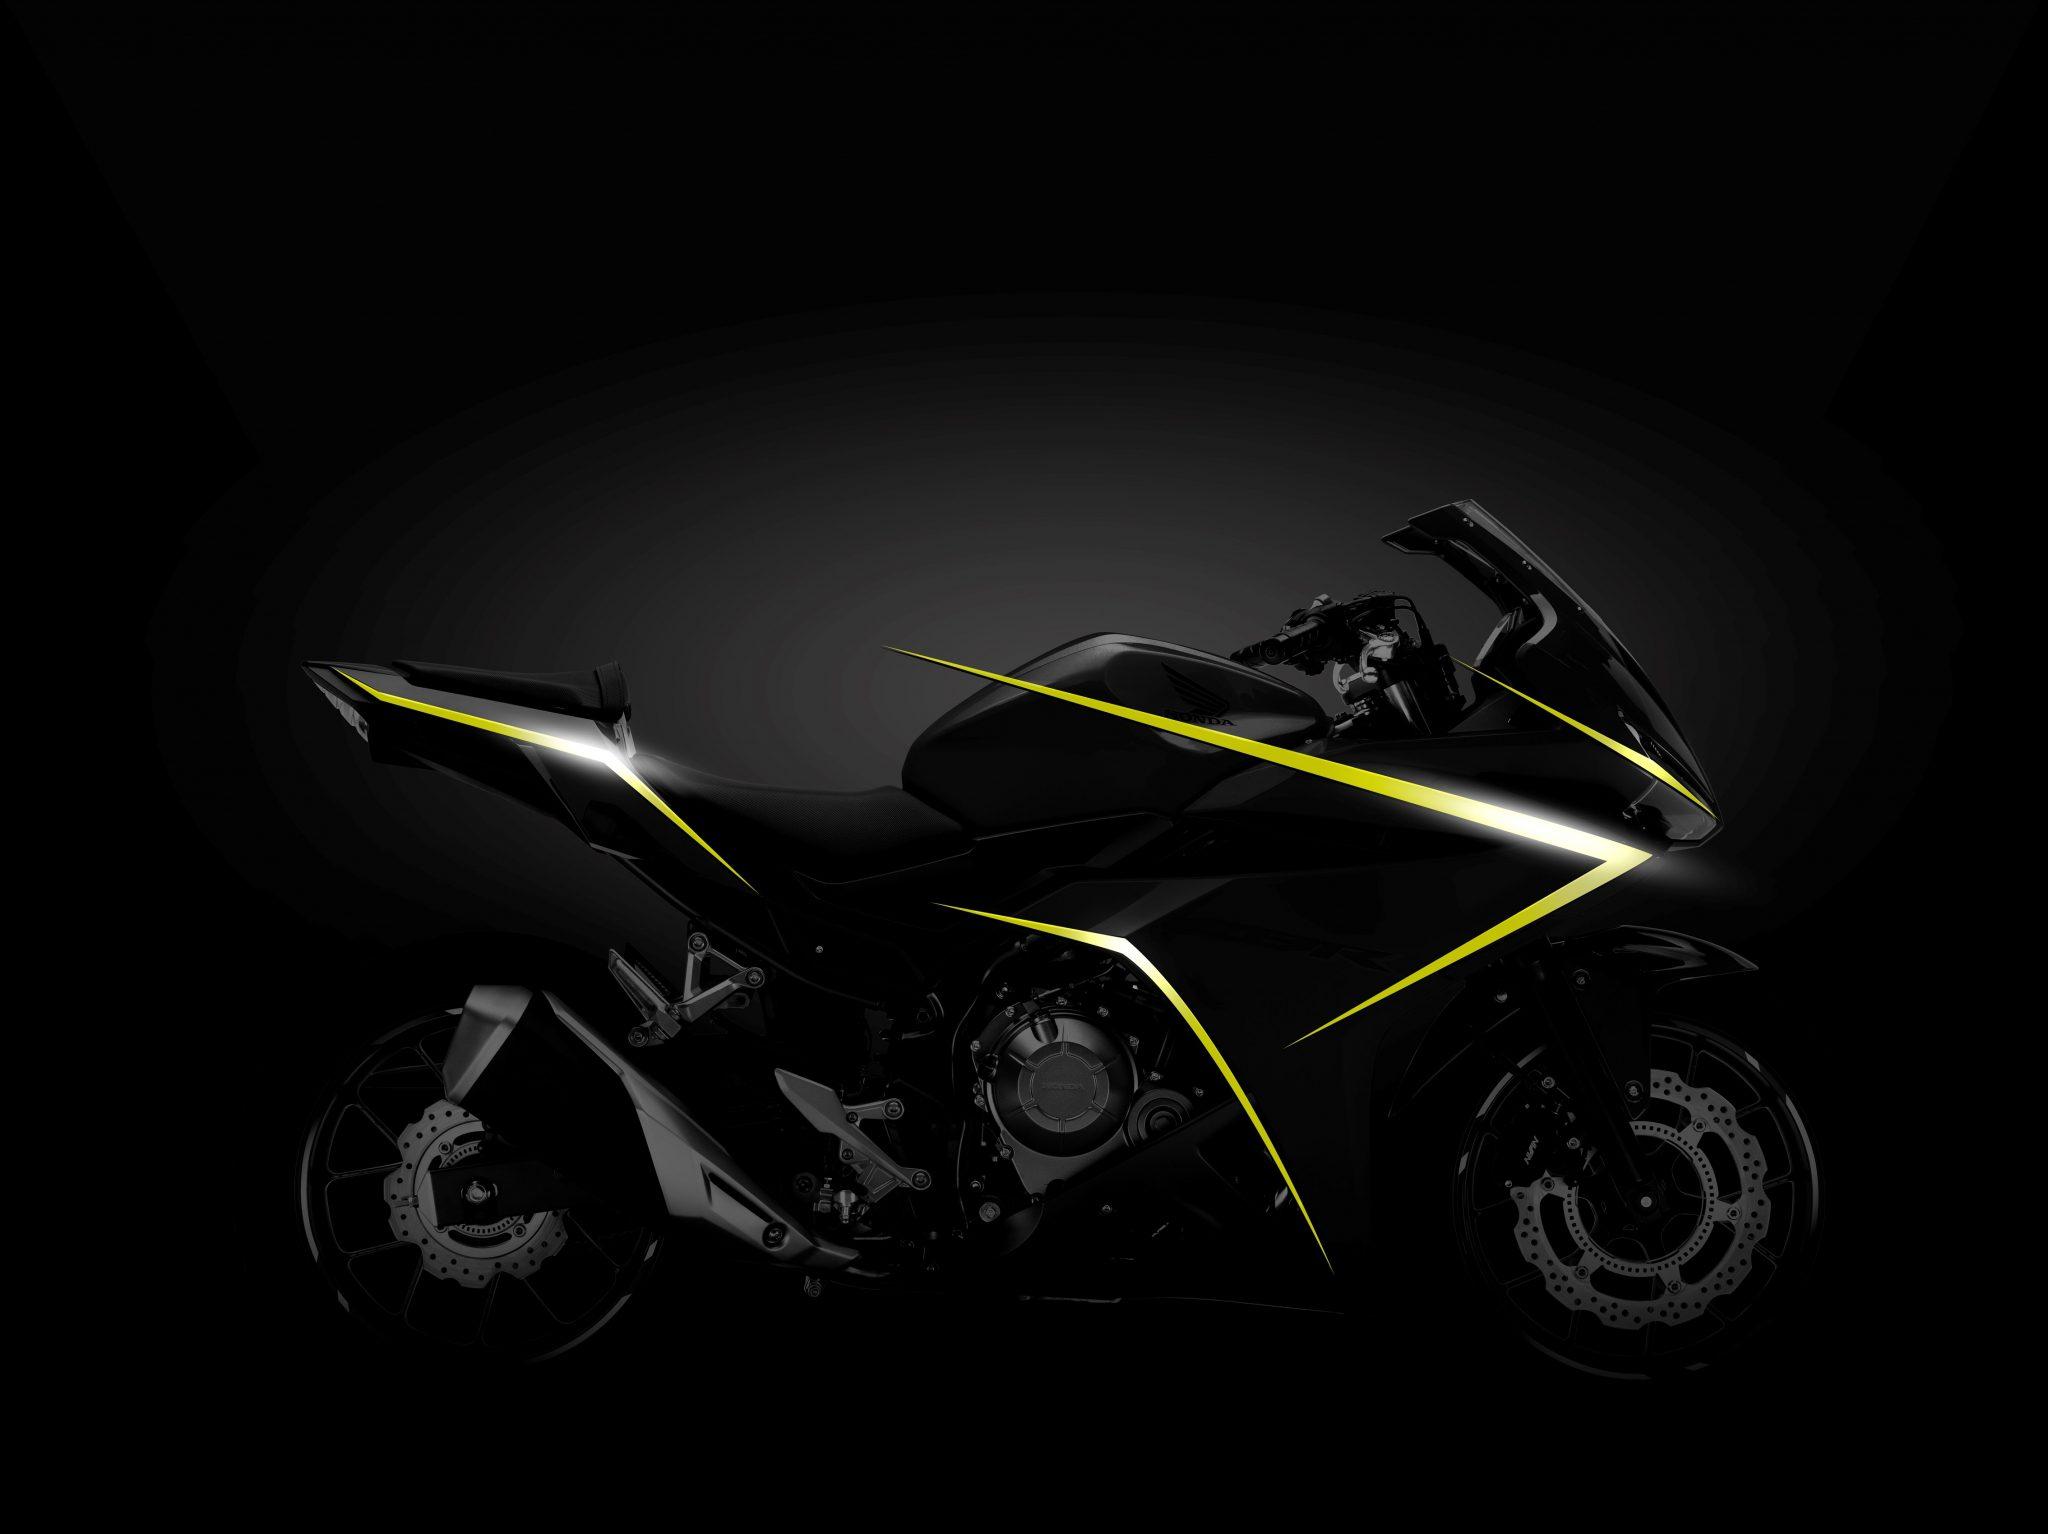 Spannende Honda CBR500R!